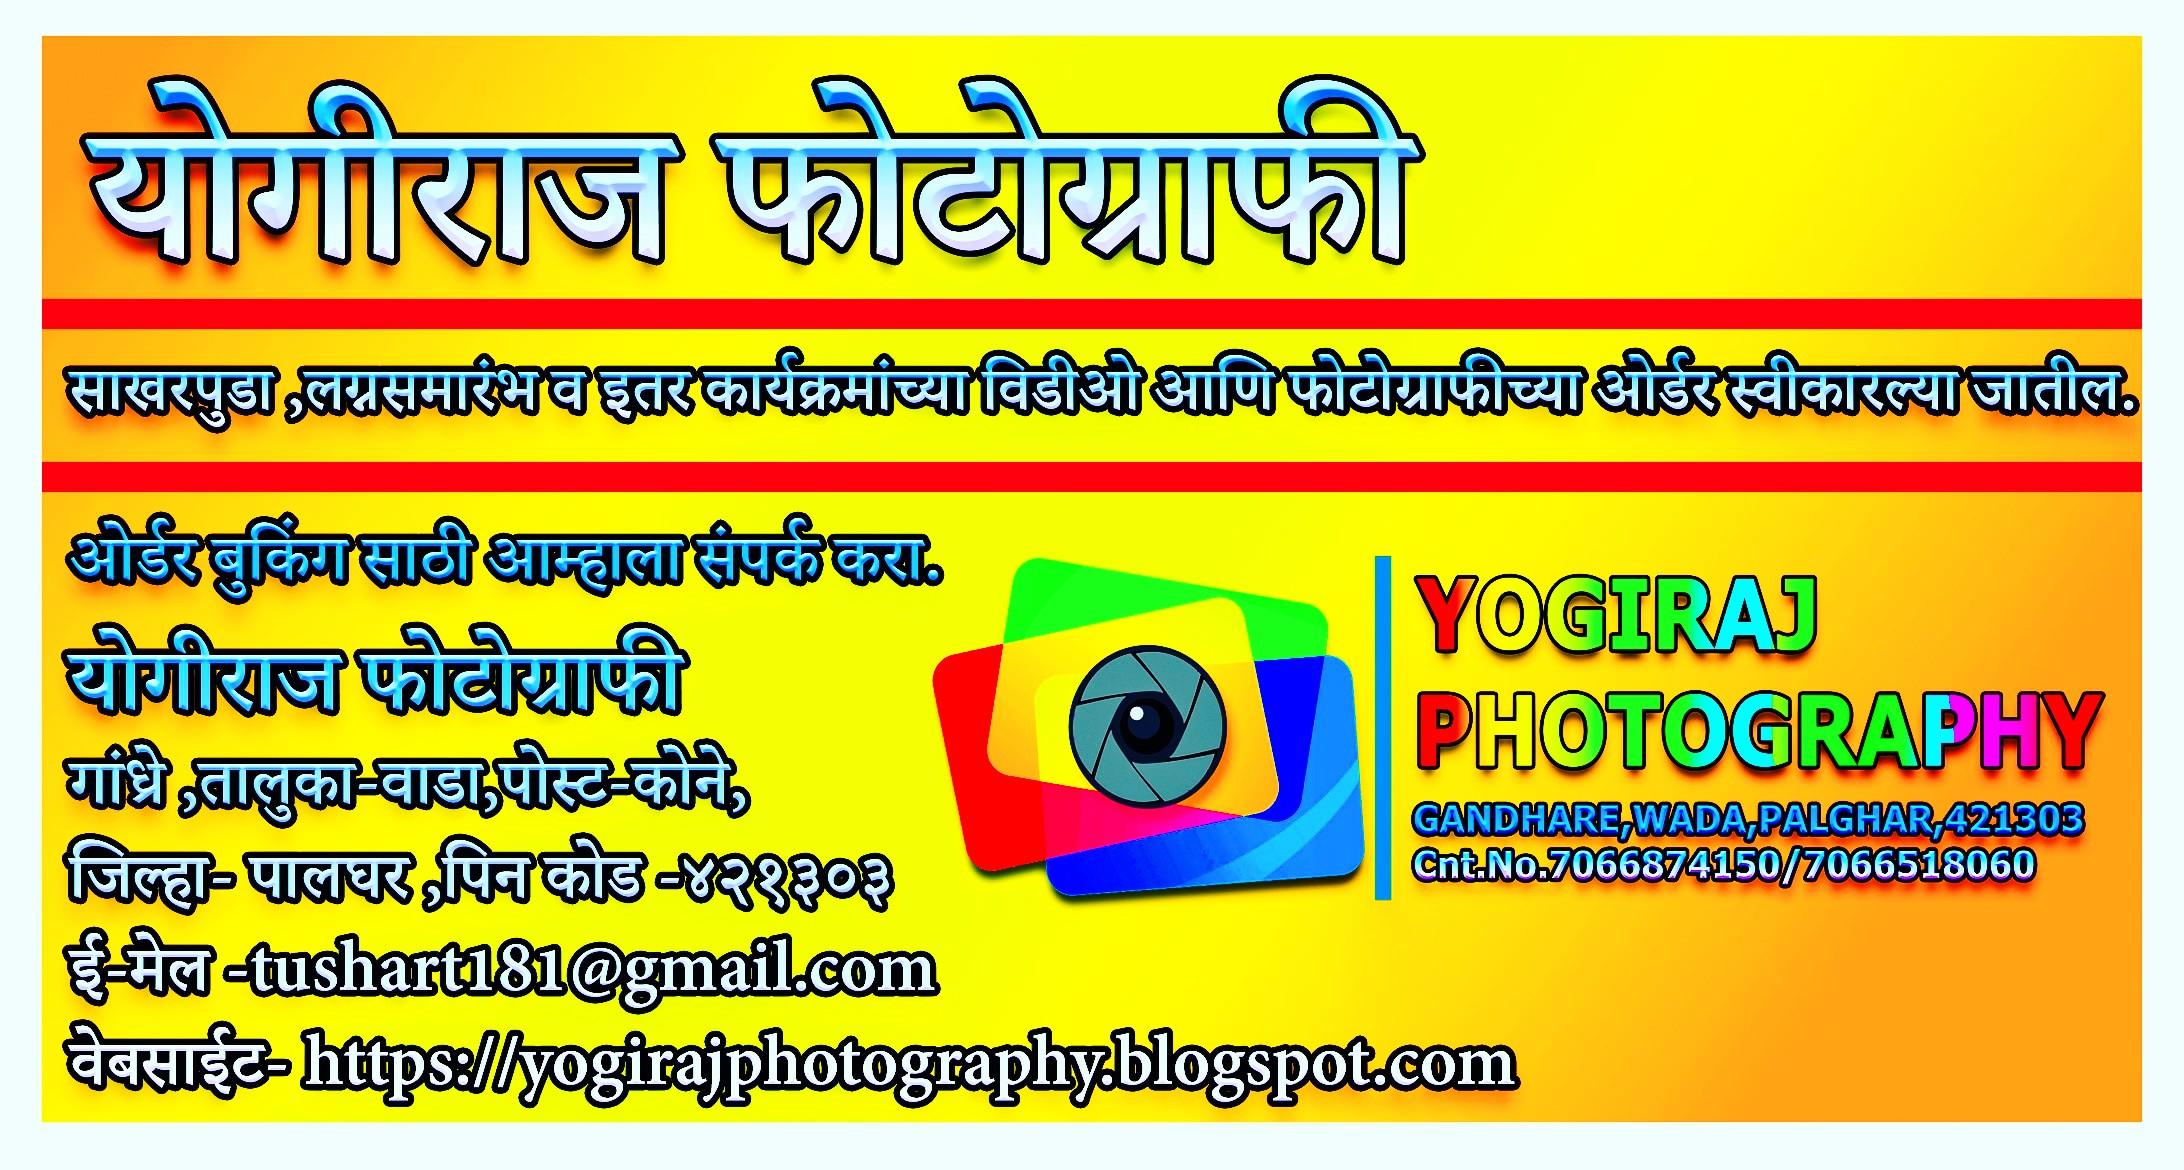 YOGIRAJ PHOTOGRAPHY